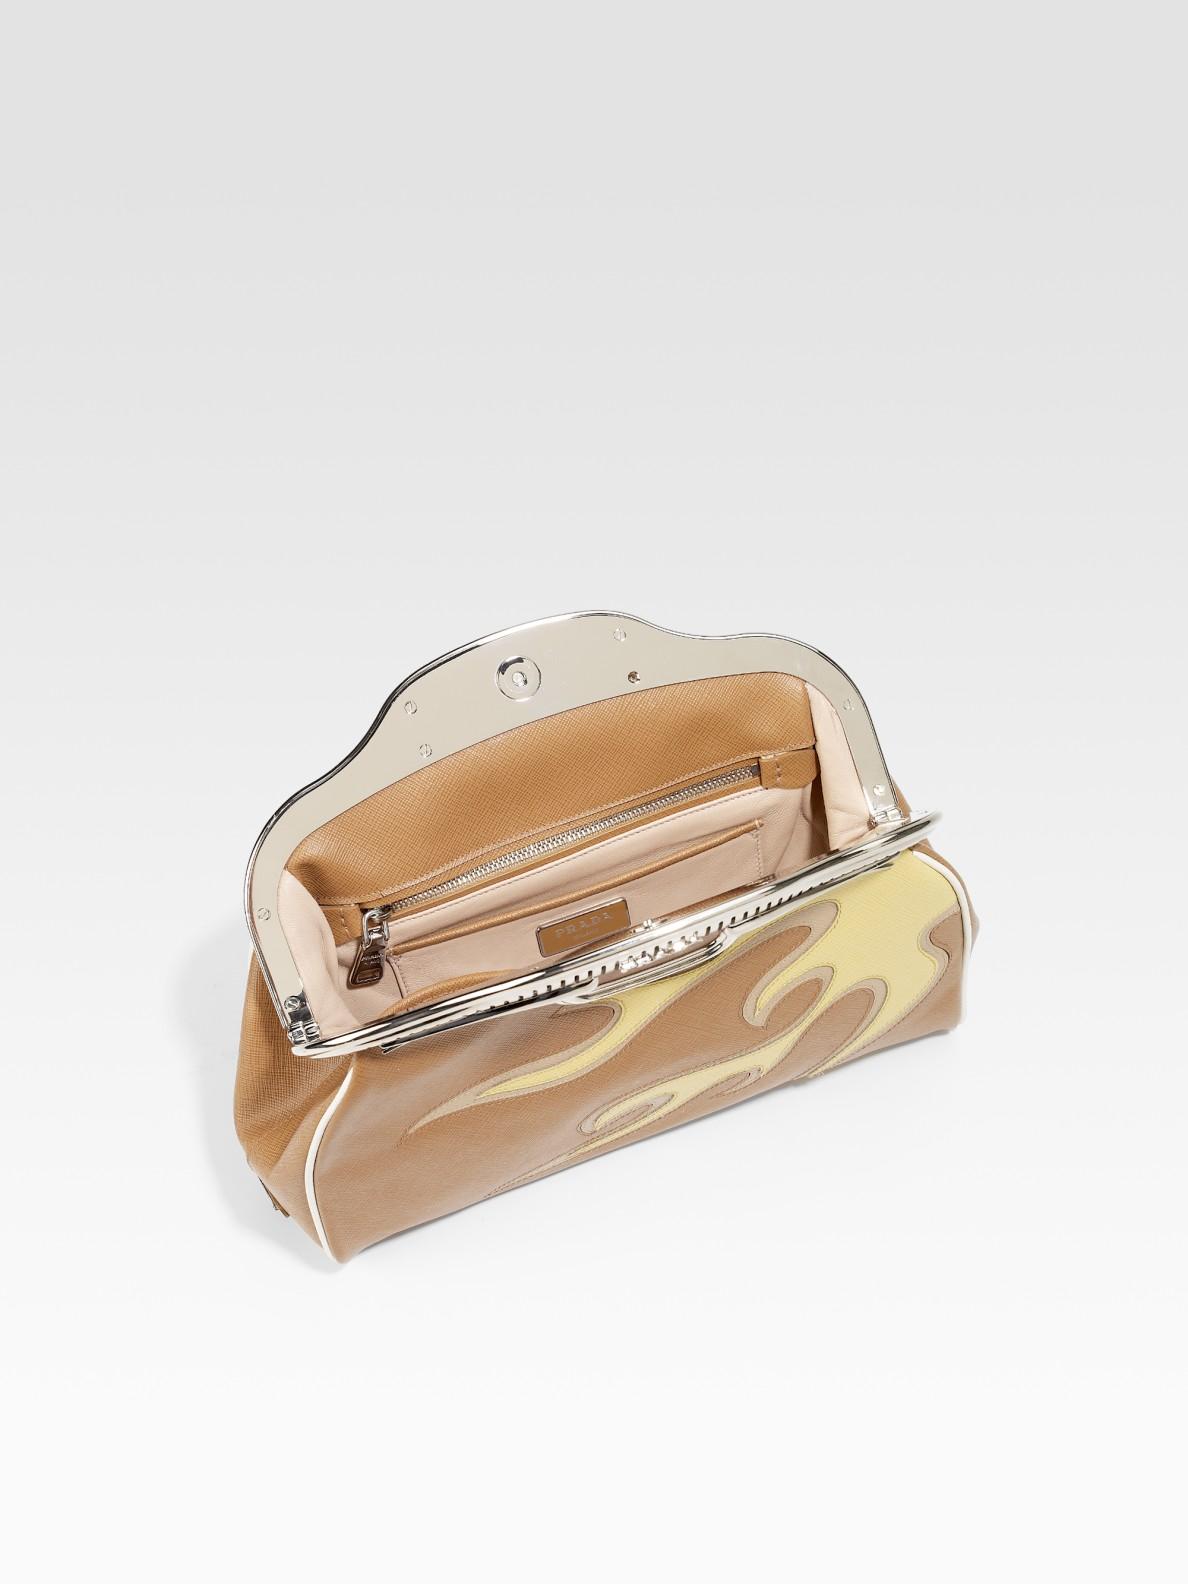 orange prada - prada flame clutch, prada mens wallets online